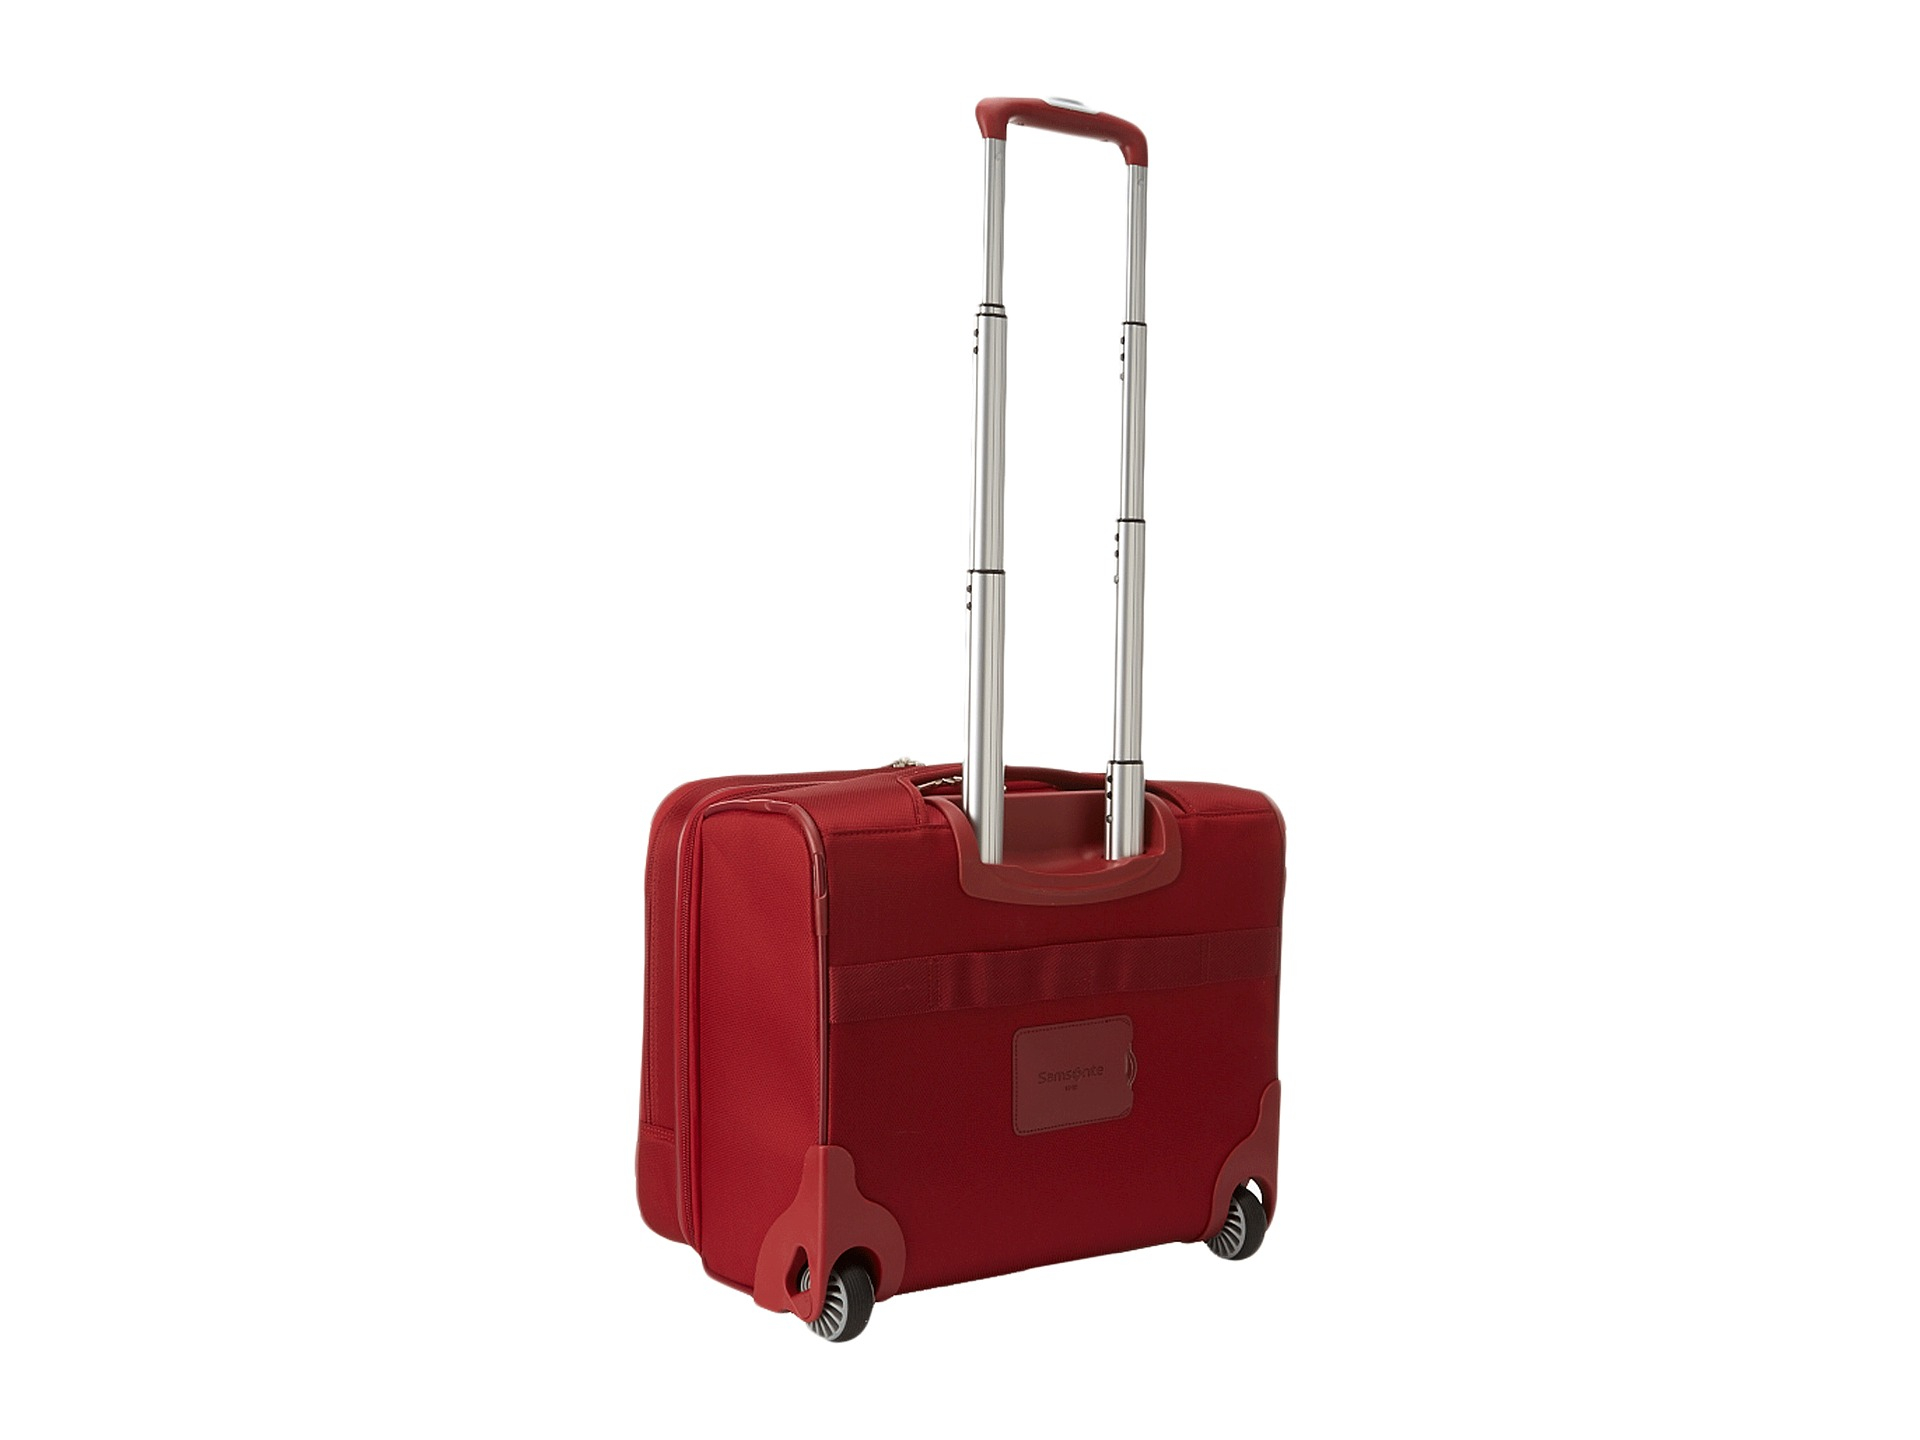 bfb8b9244841 Lyst - Samsonite Lift2 Wheeled Boarding Bag in Red